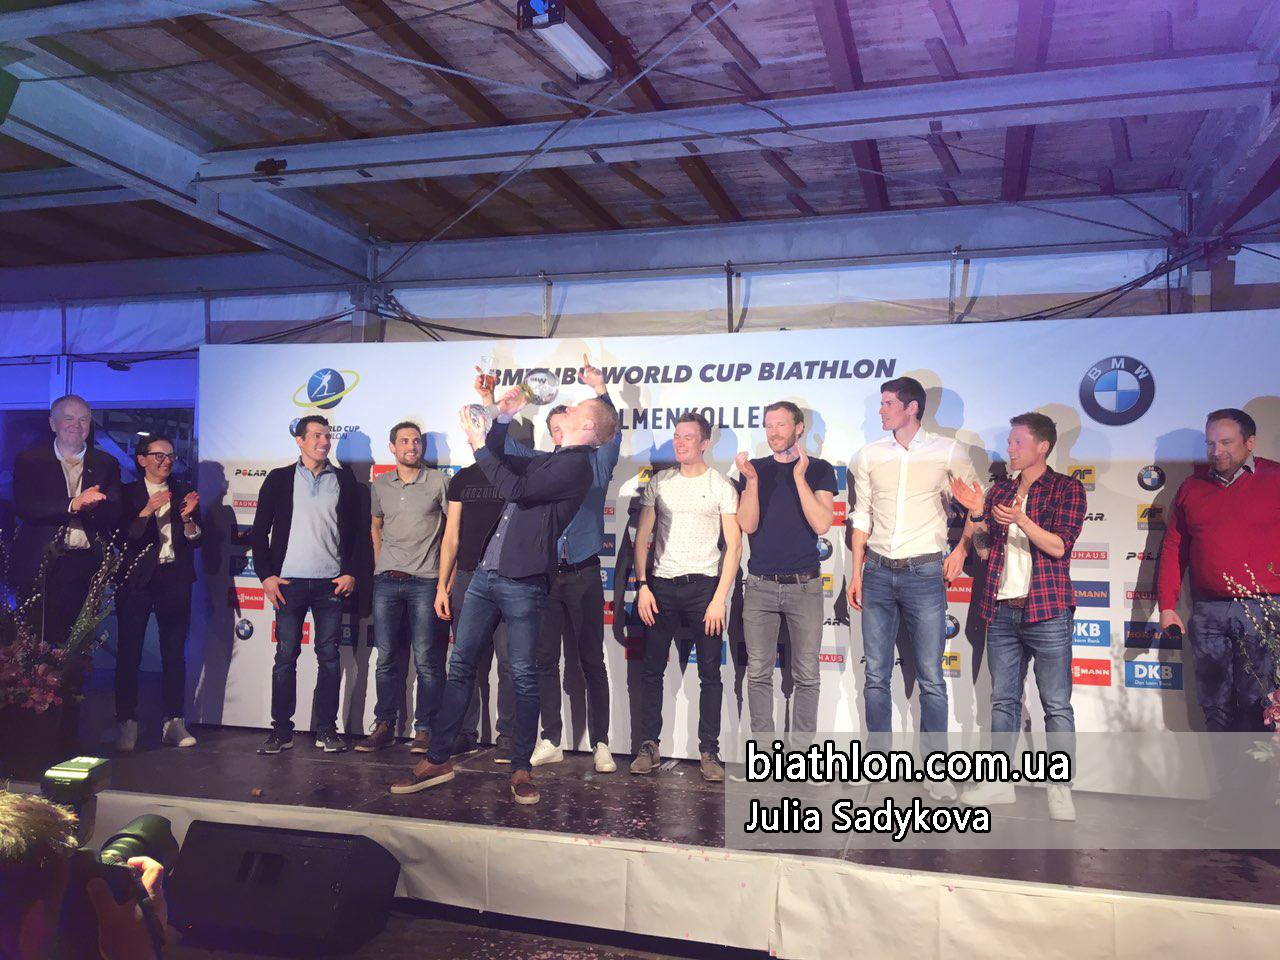 https://www.biathlon.com.ua/uploads/2019/99325.jpg